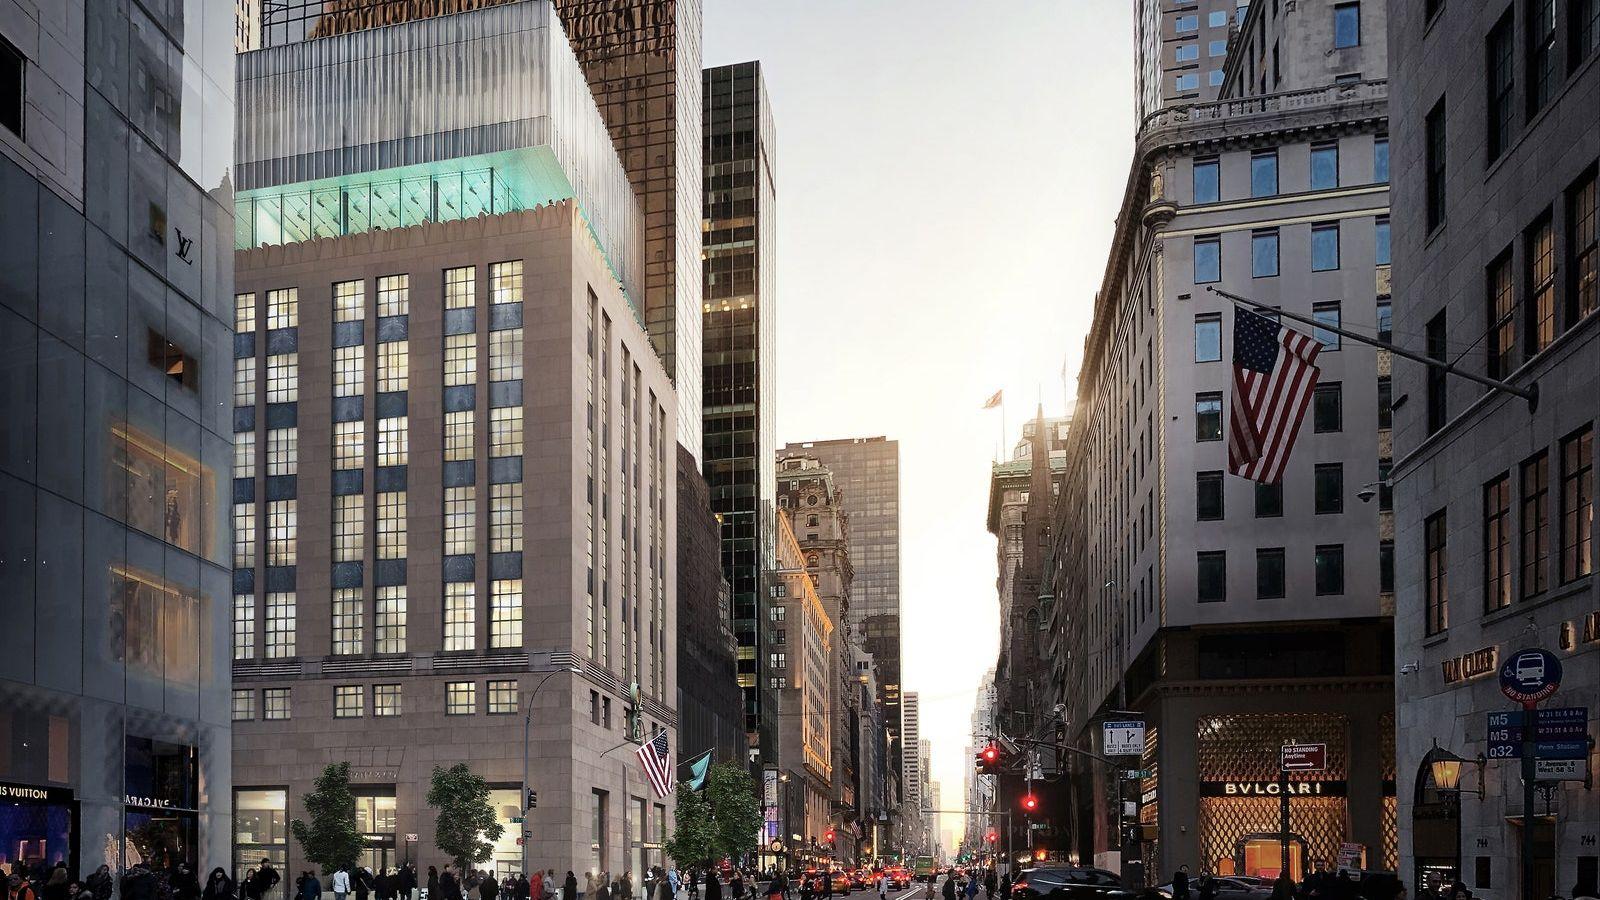 Tiffany's: Δημιουργική ανακαίνιση με γυάλινη οροφή δίνει νέα διάσταση στο ιστορικό κτίριο του 1940 στη Νέα Υόρκη